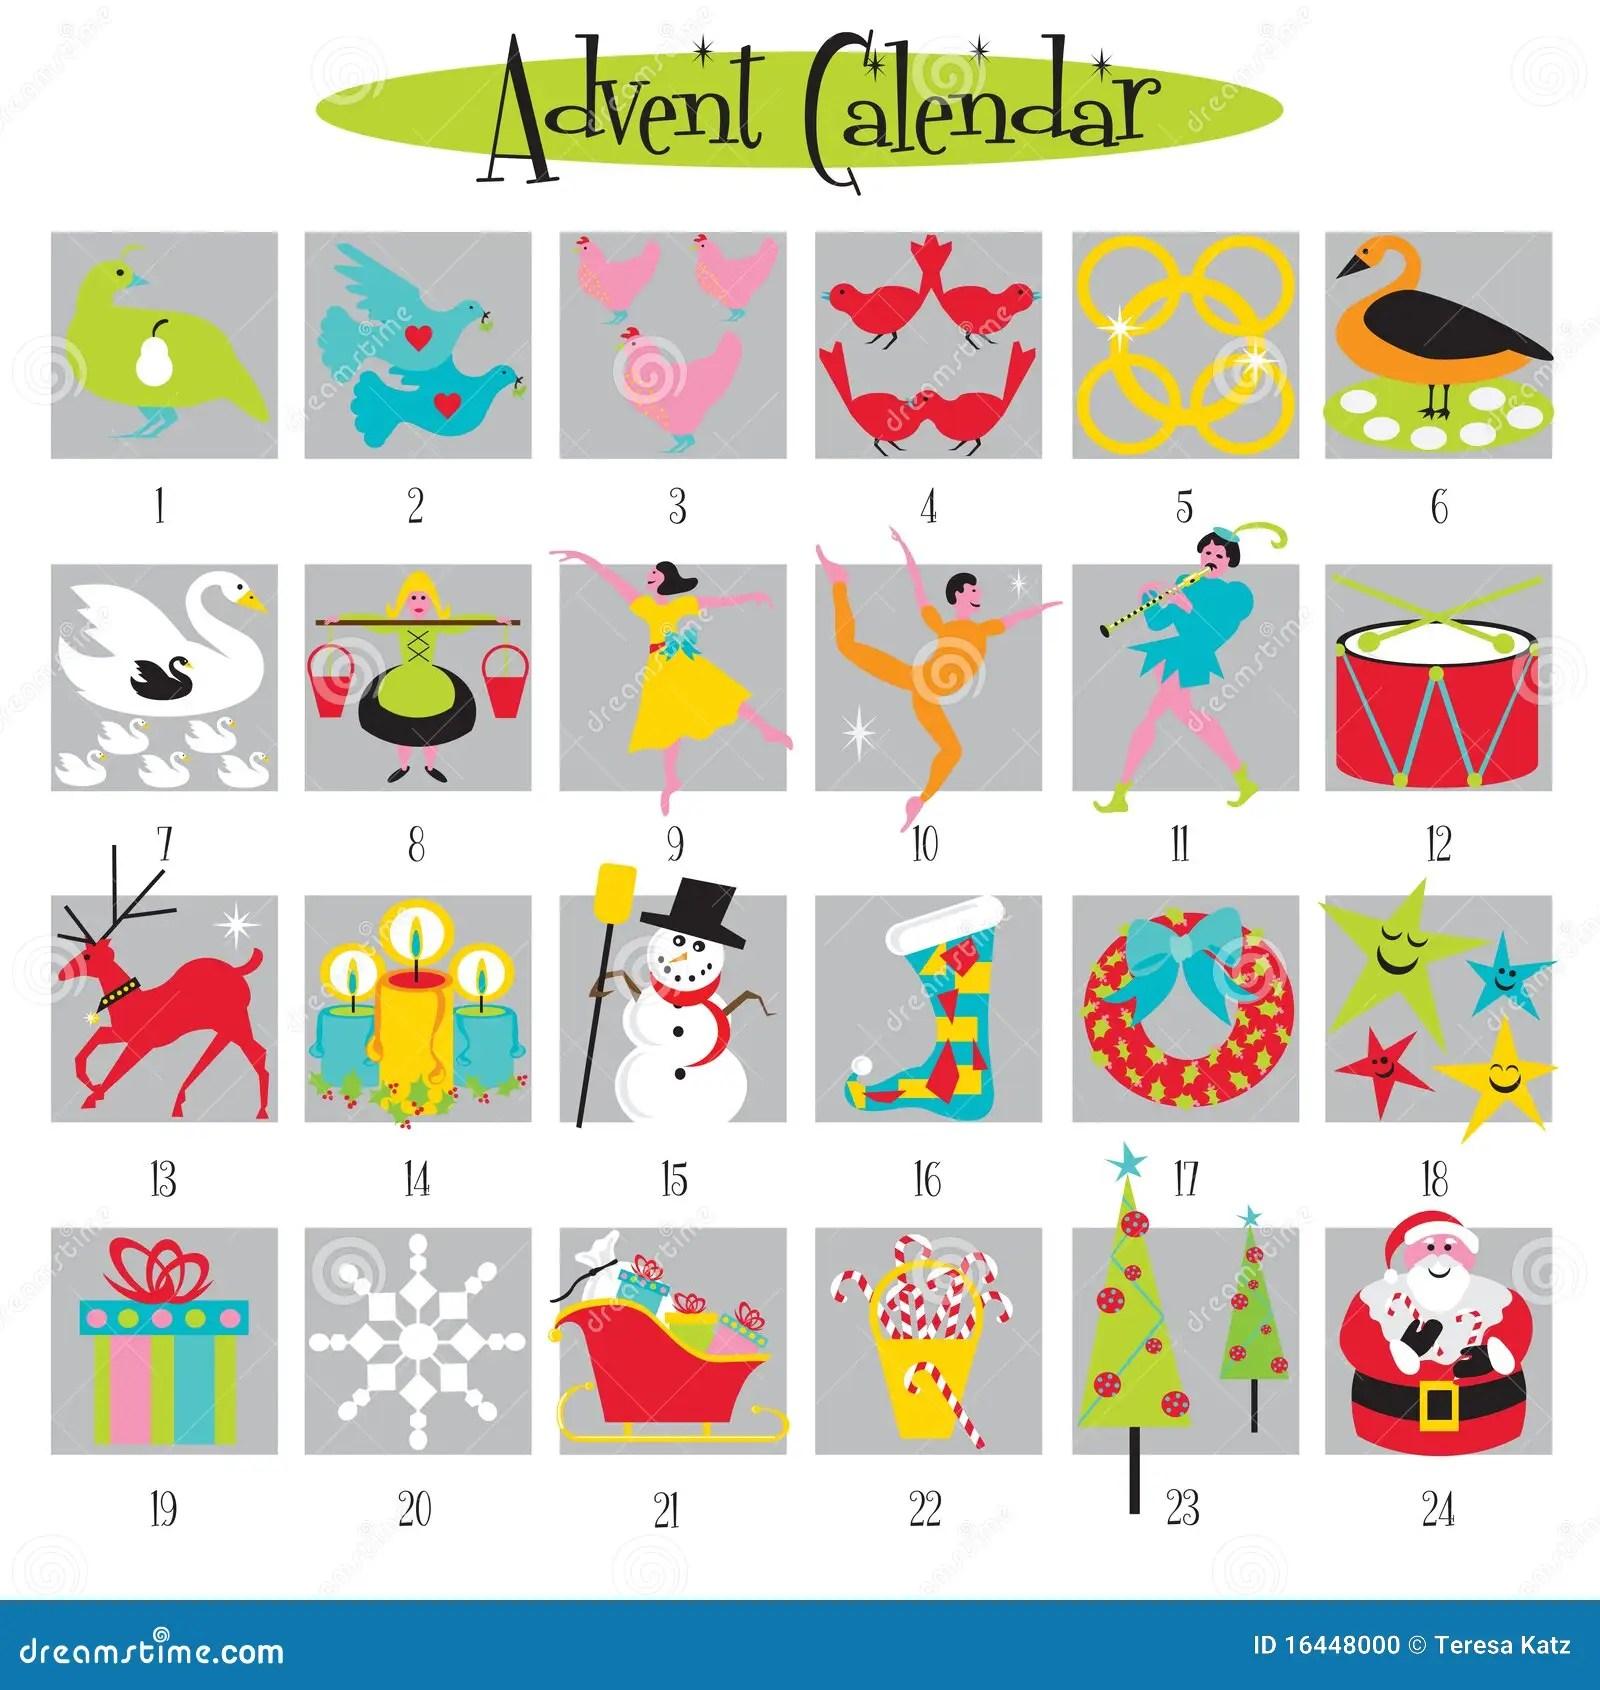 12 Days Of Christmas And Advent Calendar Stock Photo